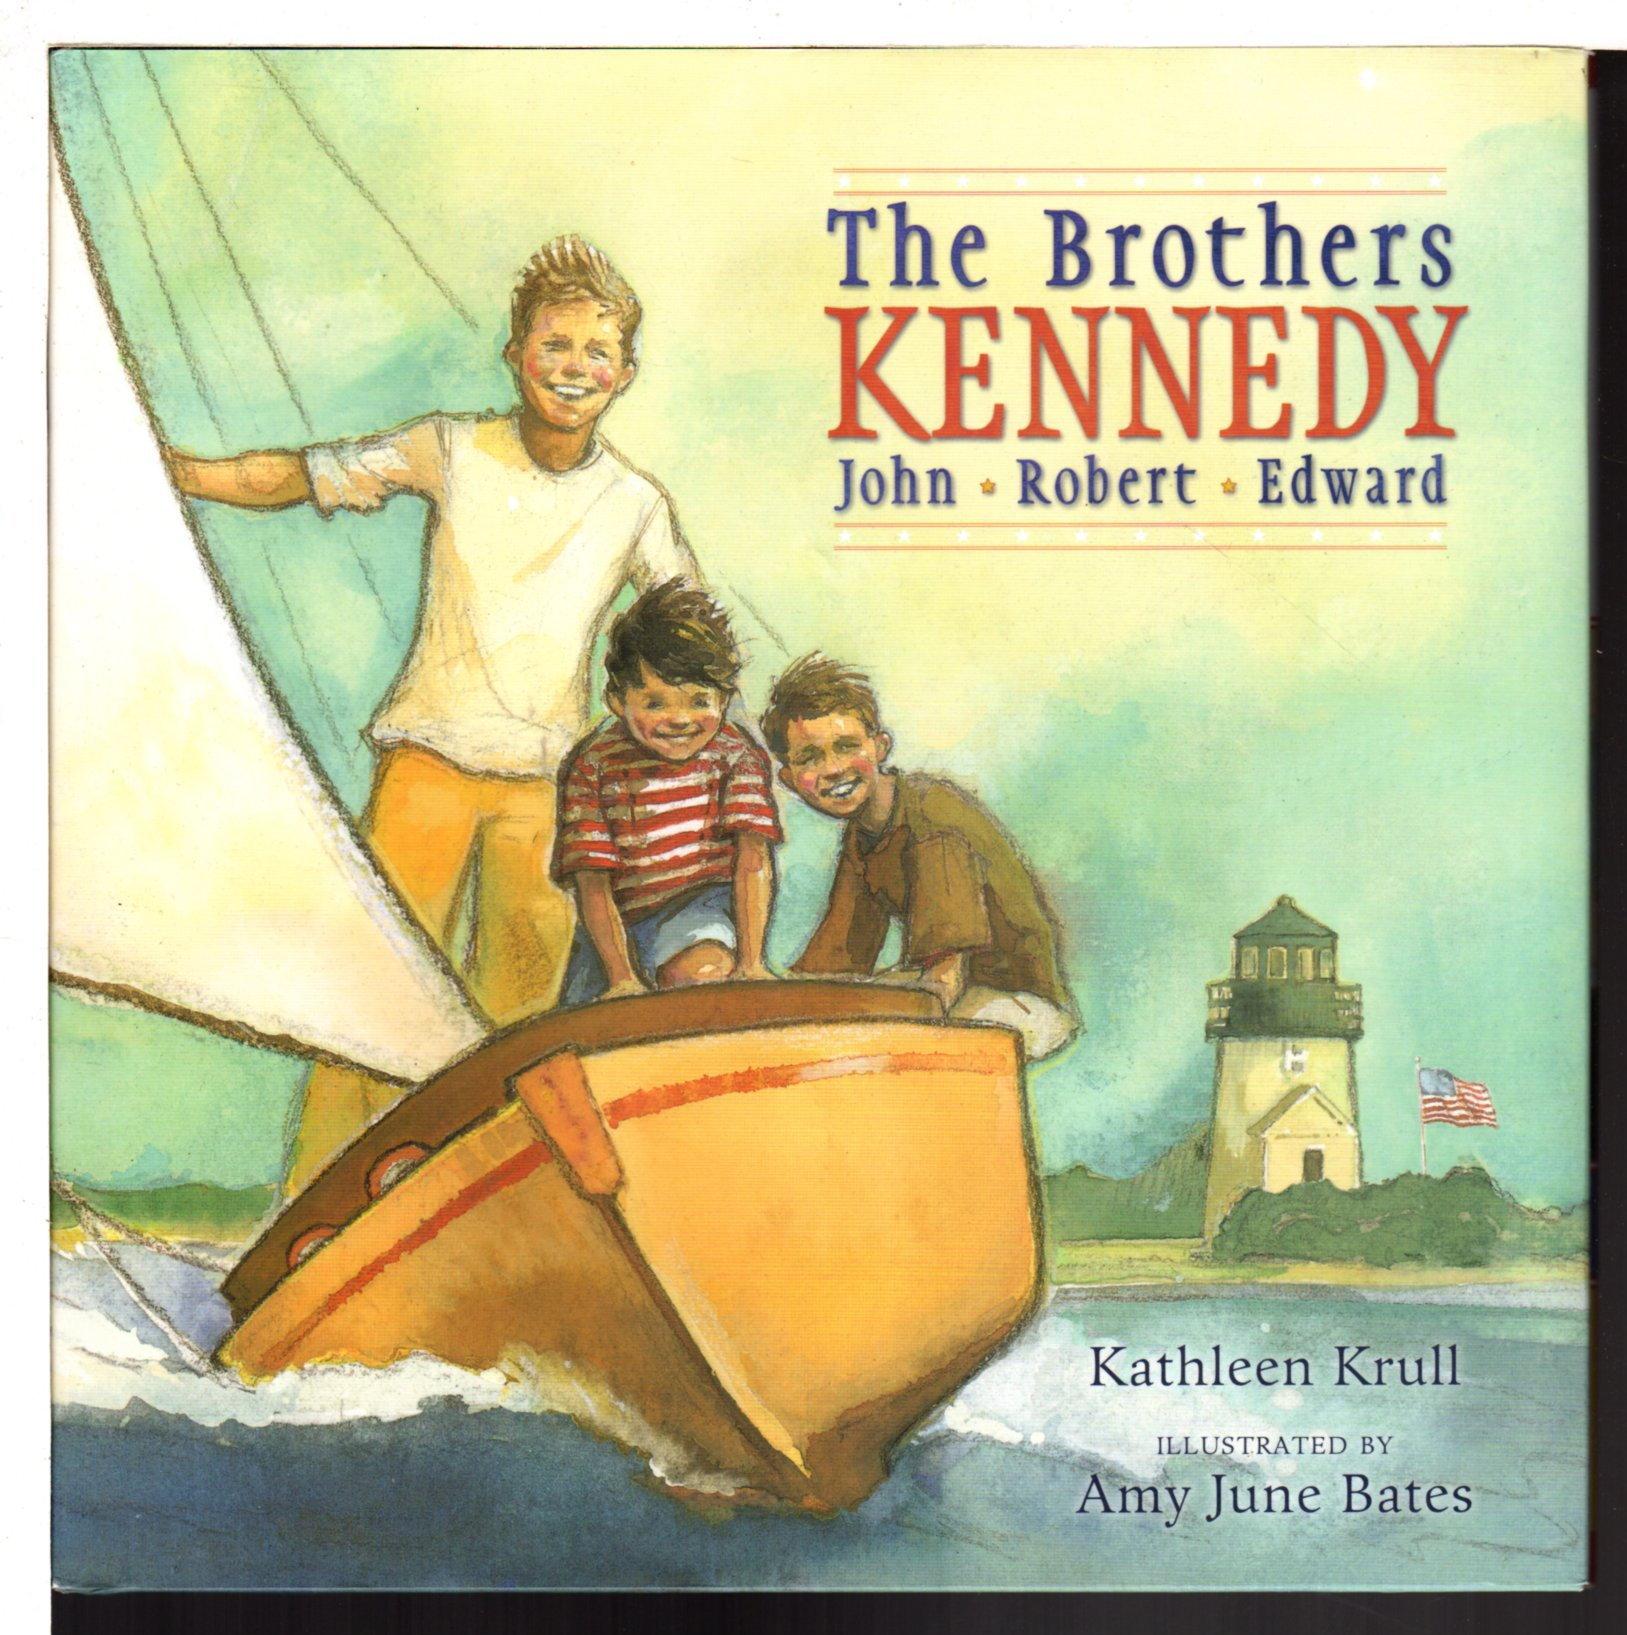 KRULL, KATHLEEN. - THE BROTHERS KENNEDY: JOHN, ROBERT, EDWARD.